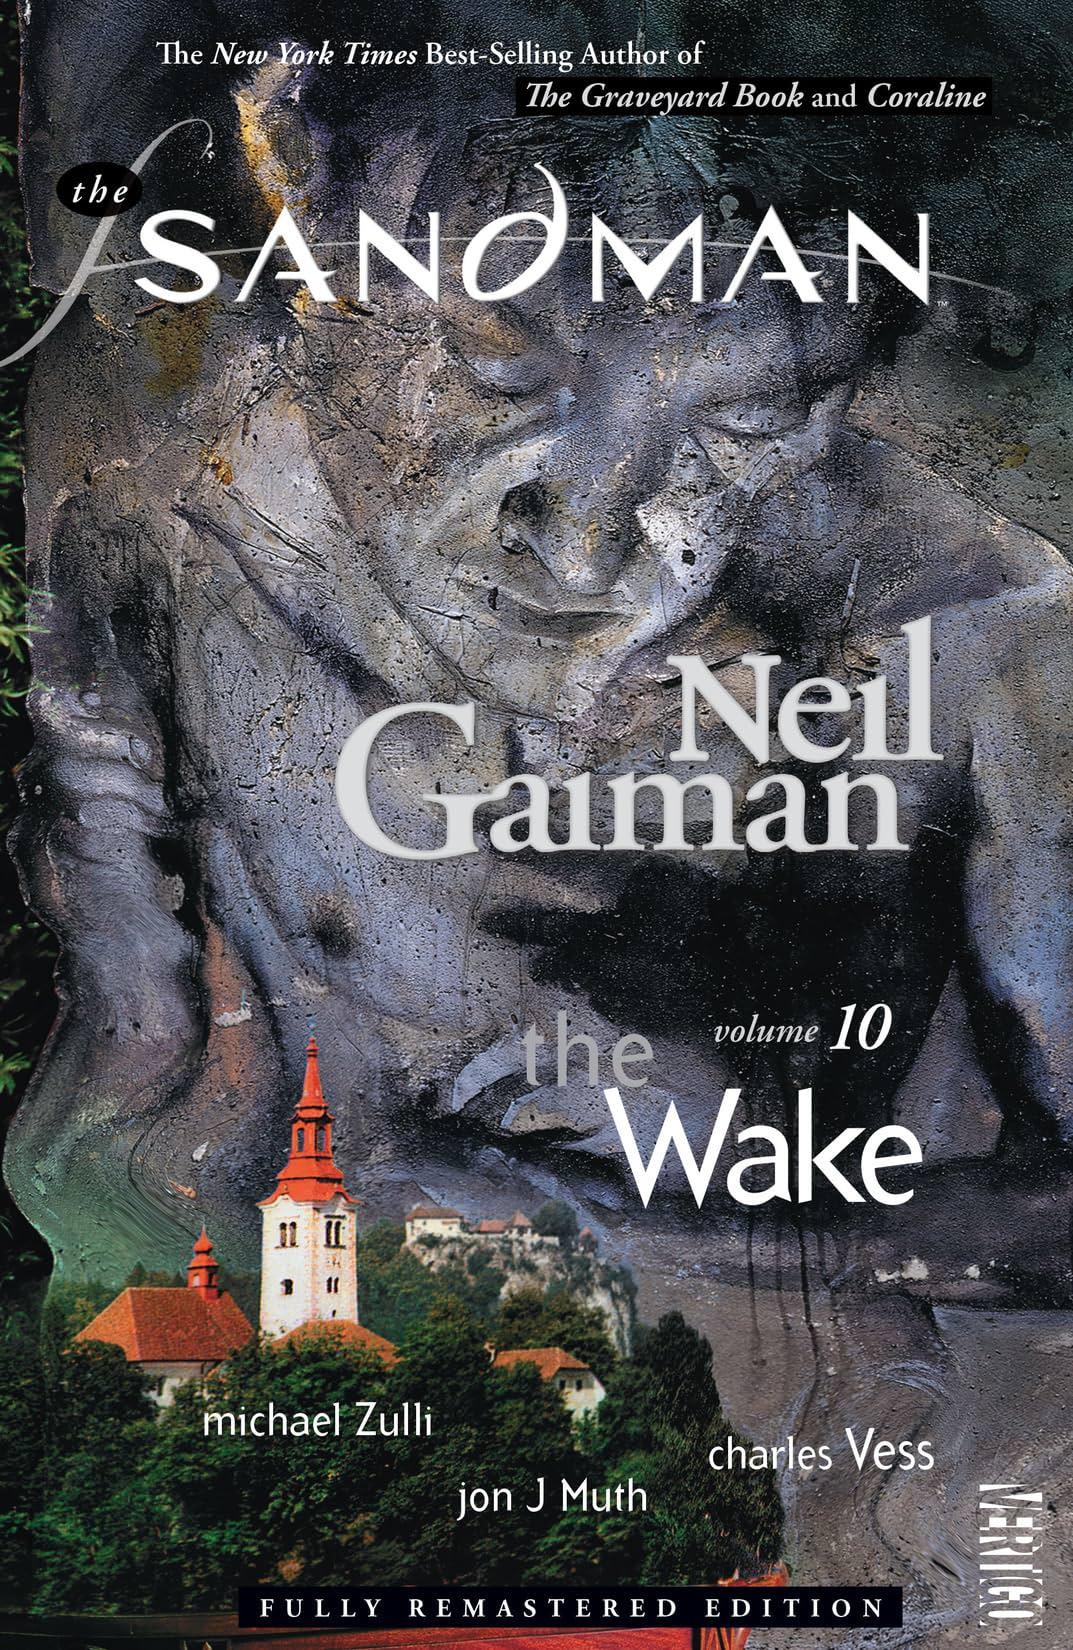 The Sandman Tome 10: The Wake